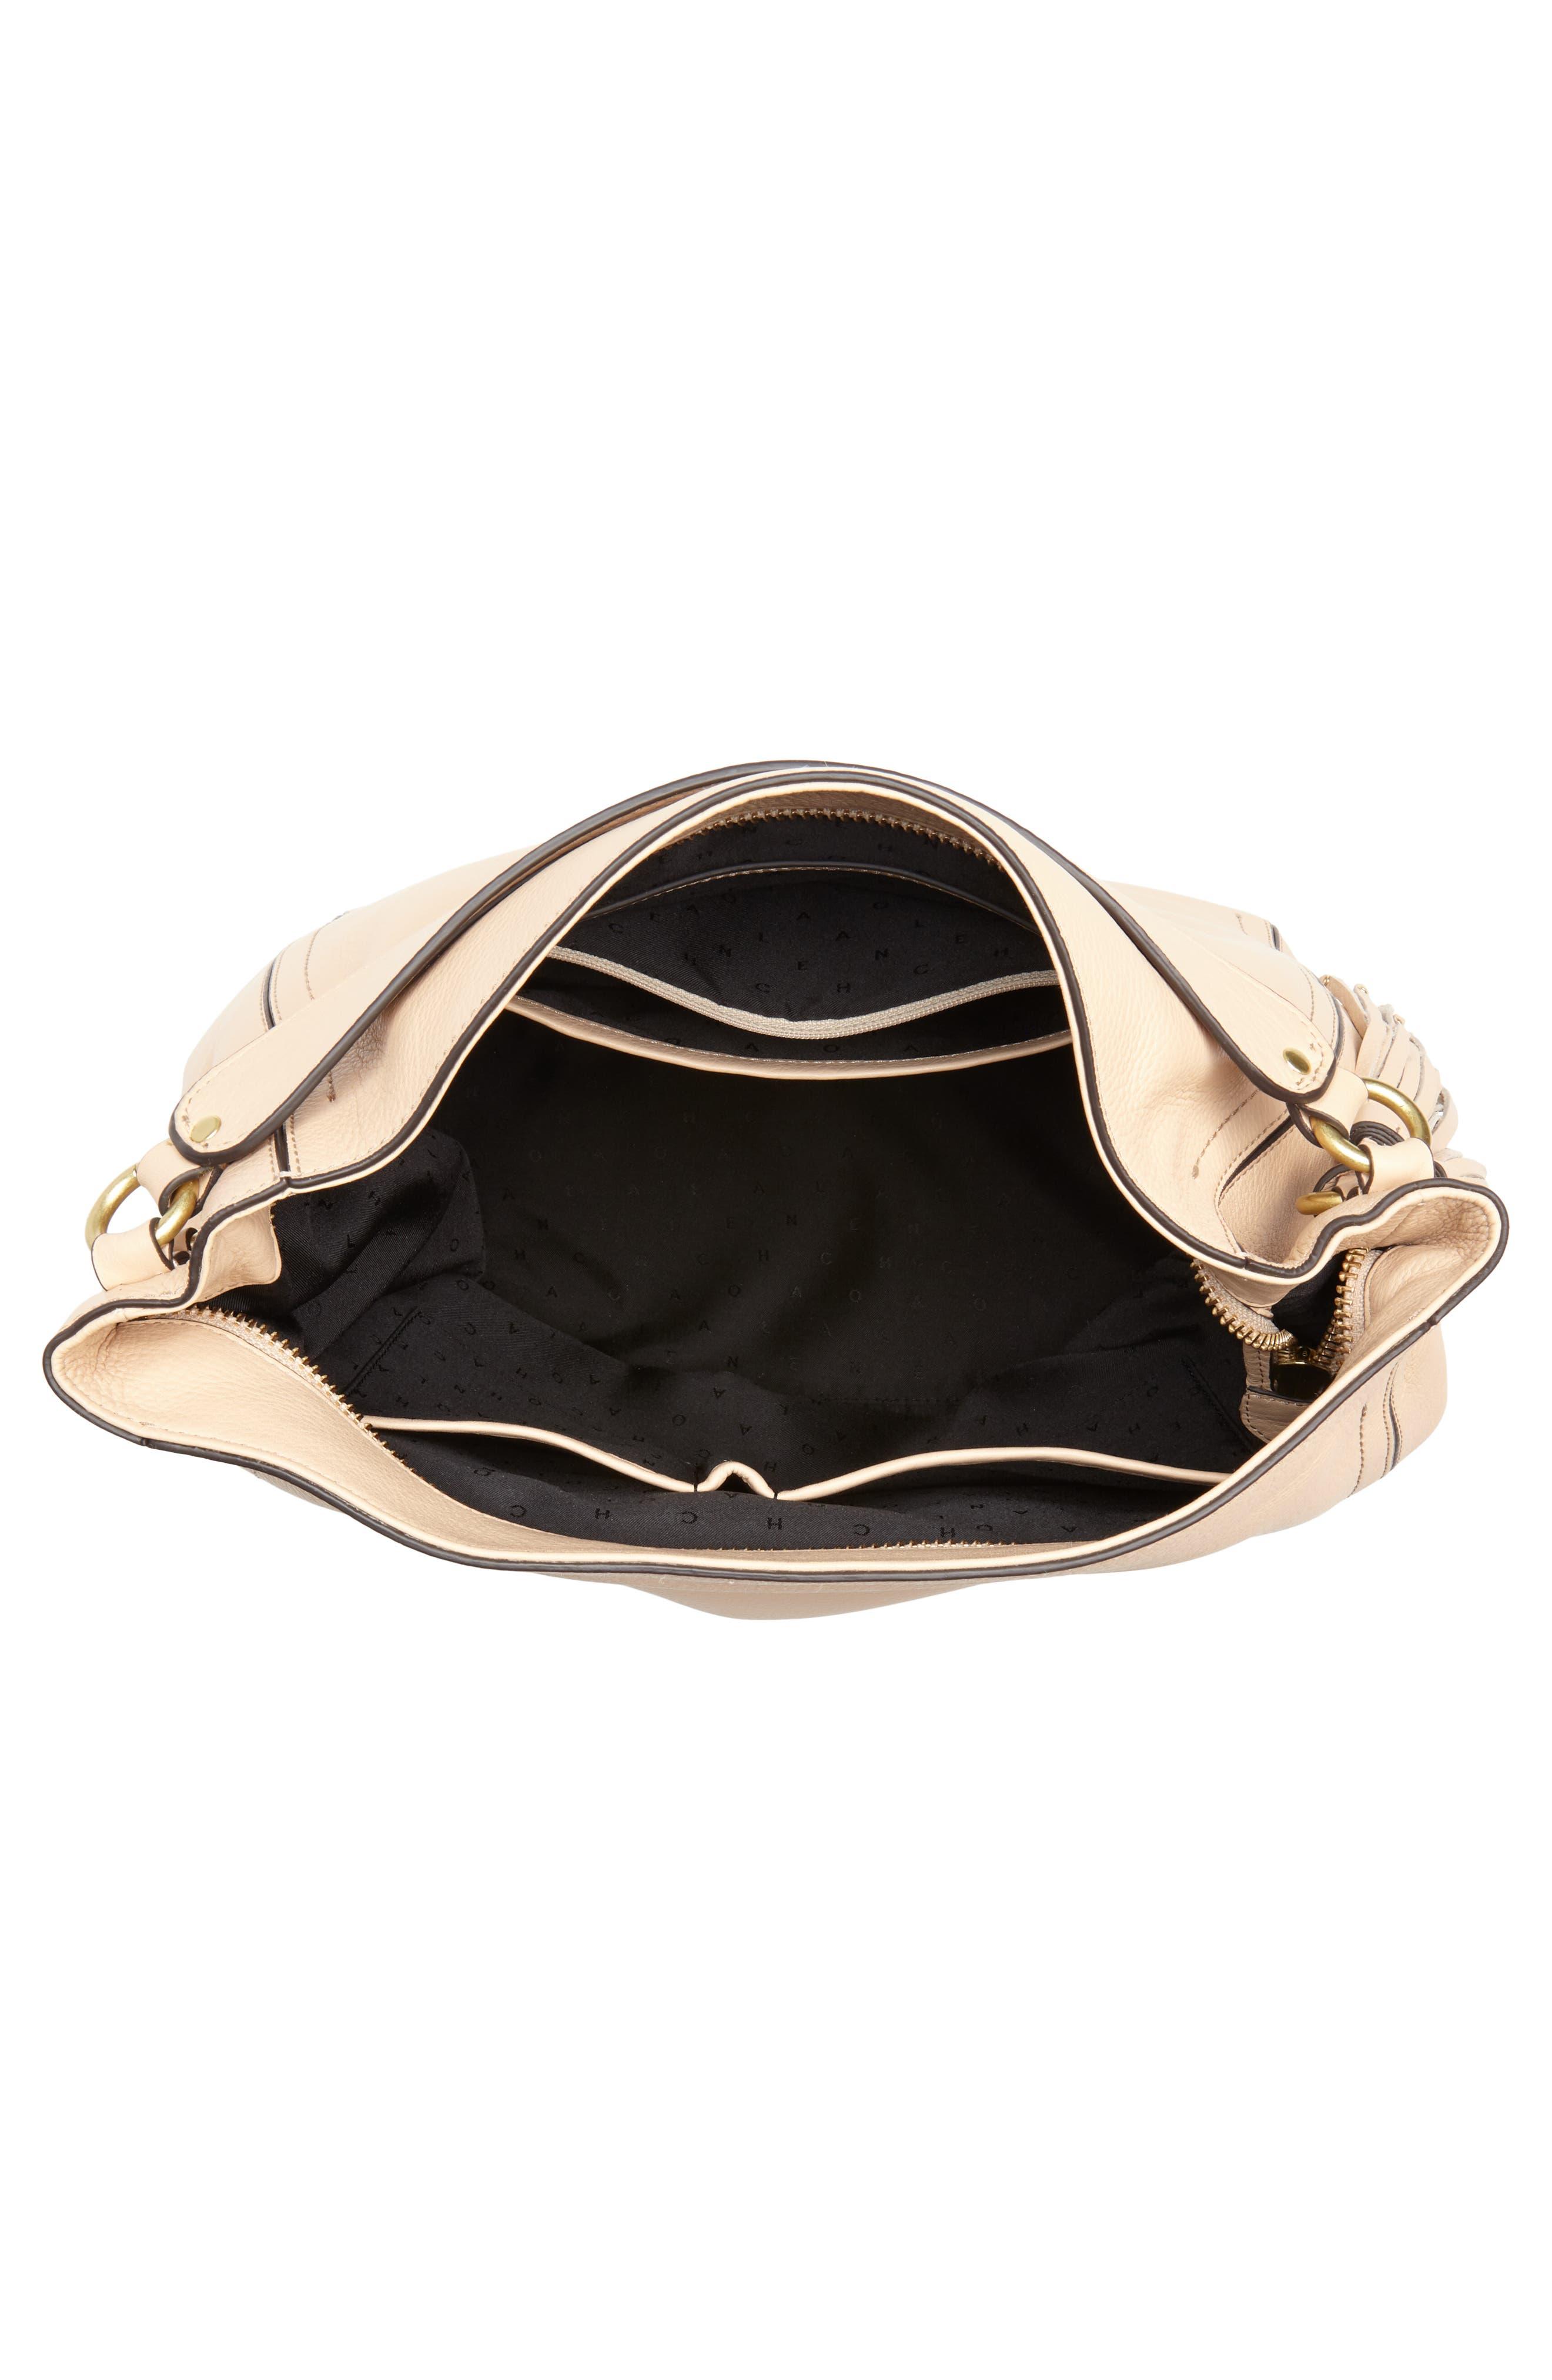 Cassidy RFID Pebbled Leather Bucket Bag,                             Alternate thumbnail 15, color,